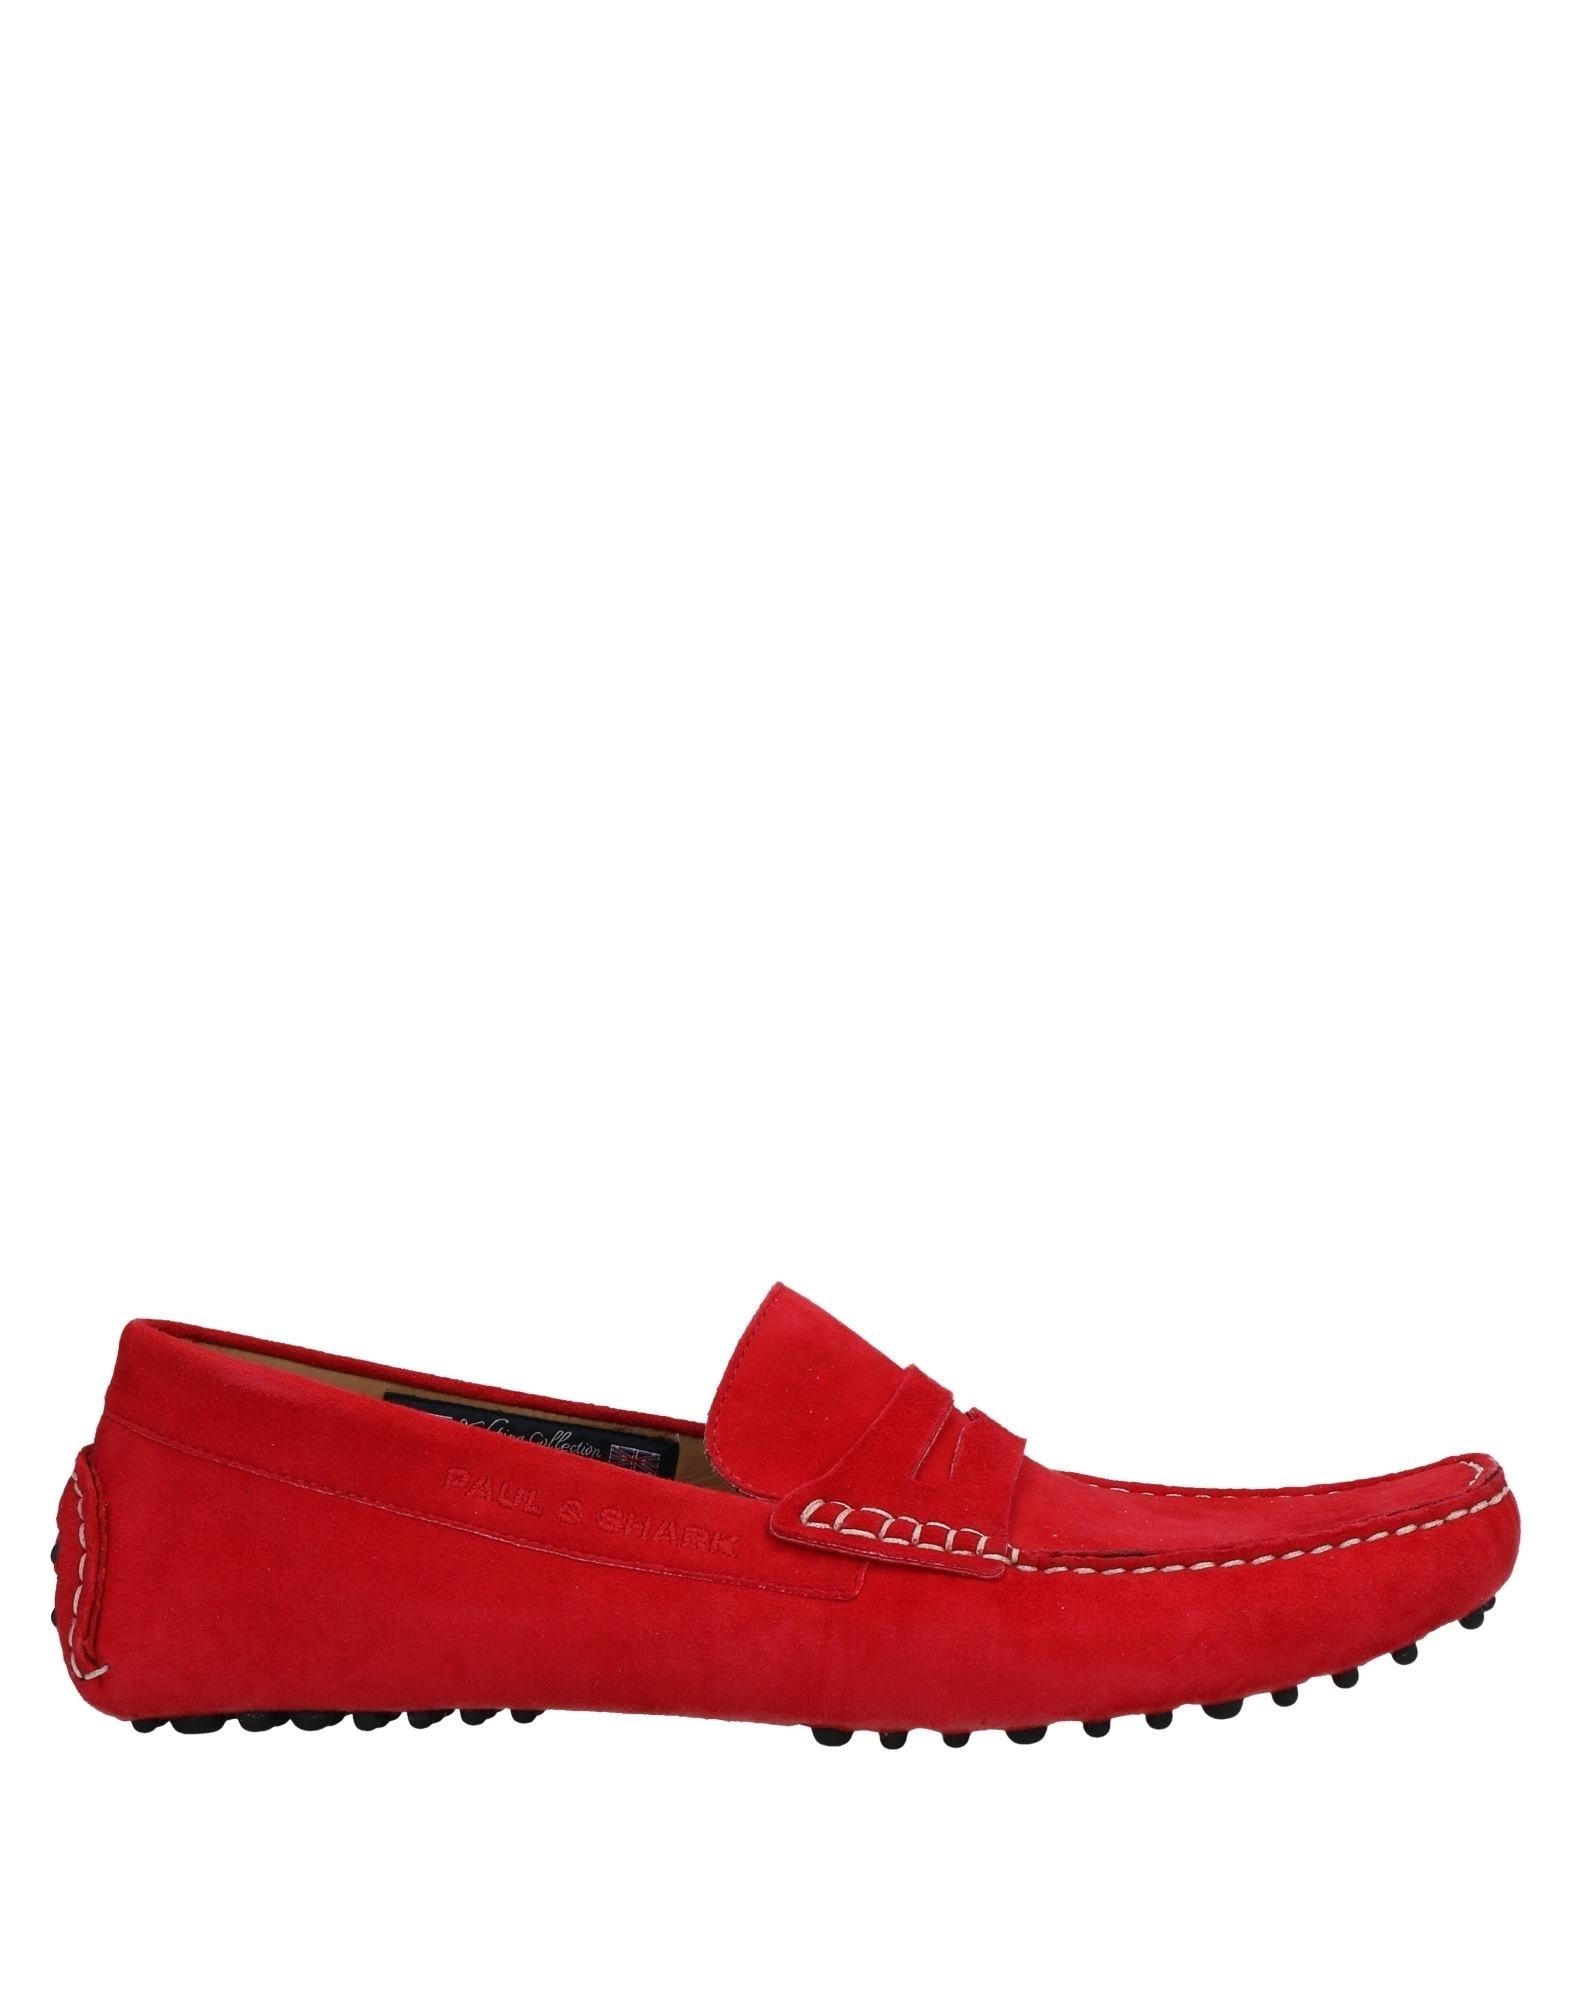 PAUL & SHARK Loafers - Item 17022898